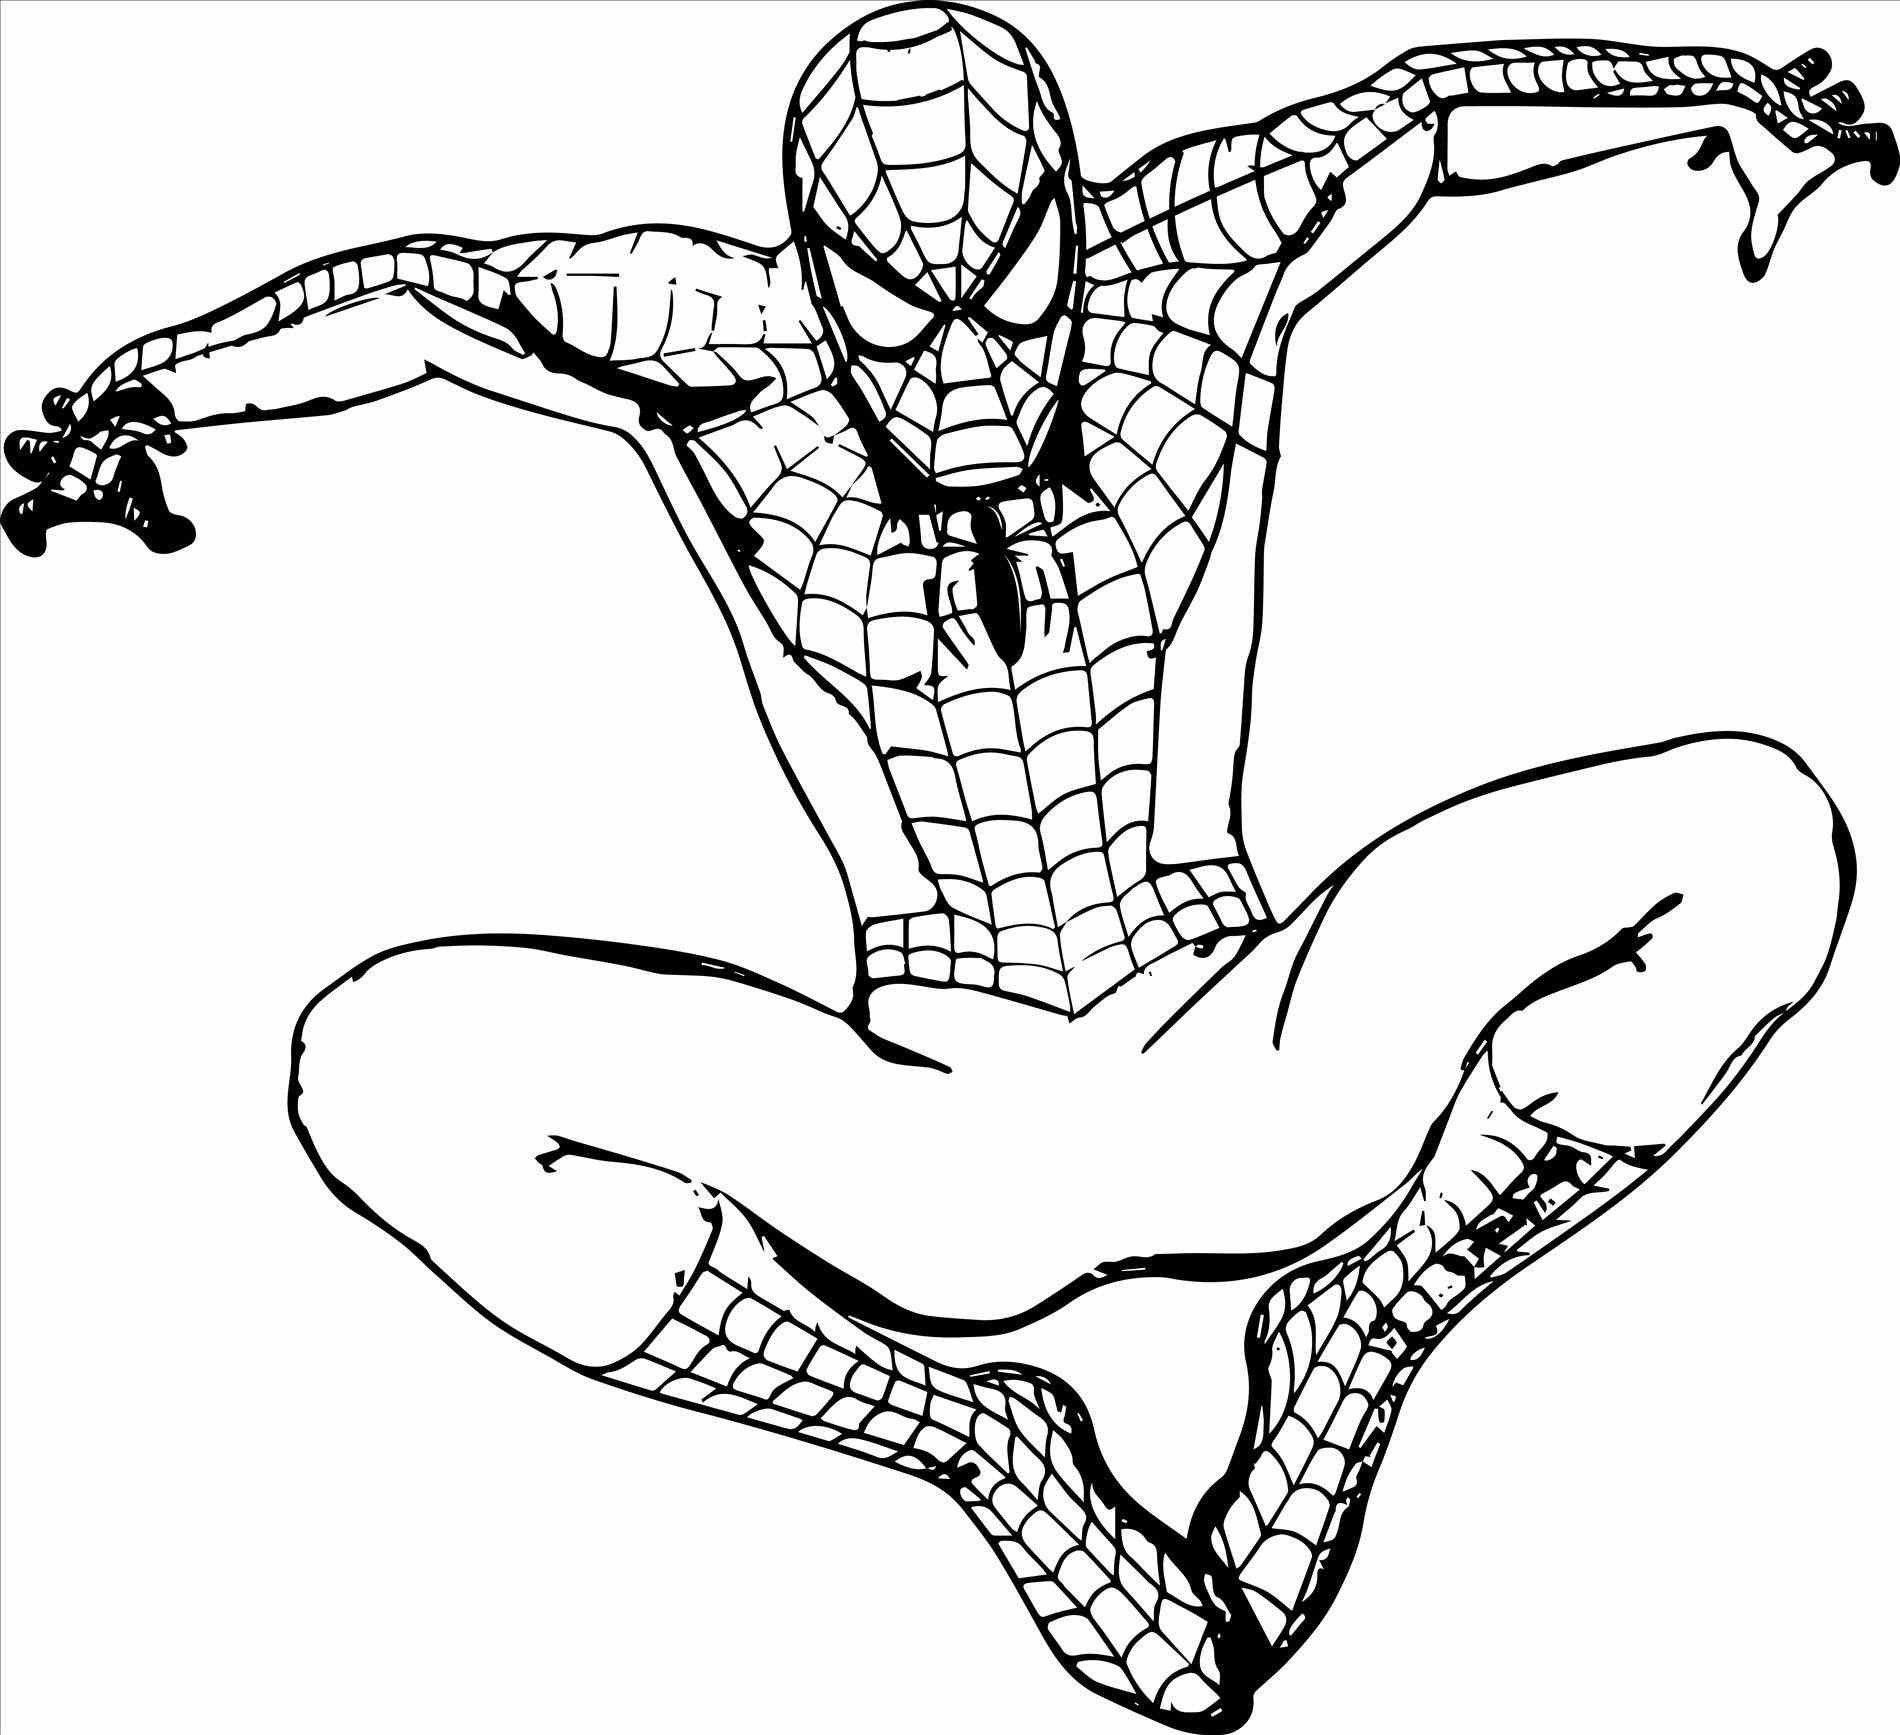 10 Spiderman 3 Superhero Coloring Pages Superhero Coloring Spiderman Coloring